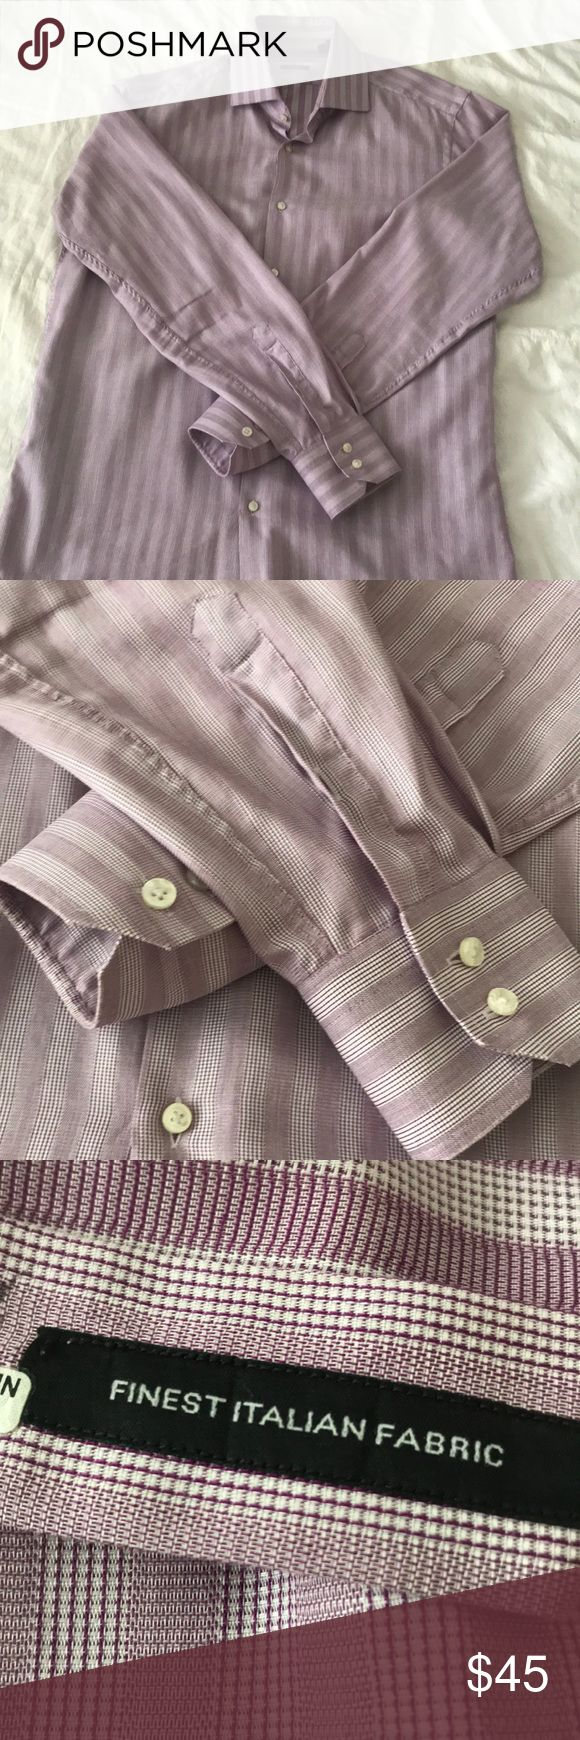 Hugo Boss long sleeve dress shirt Men's Hugo Boss dress shirt. Made of incredibly Italian fabric. 16 1/2 inch neck. Size 42. Regular fit. A beautiful burgundy pattern. Hugo Boss Shirts Dress Shirts